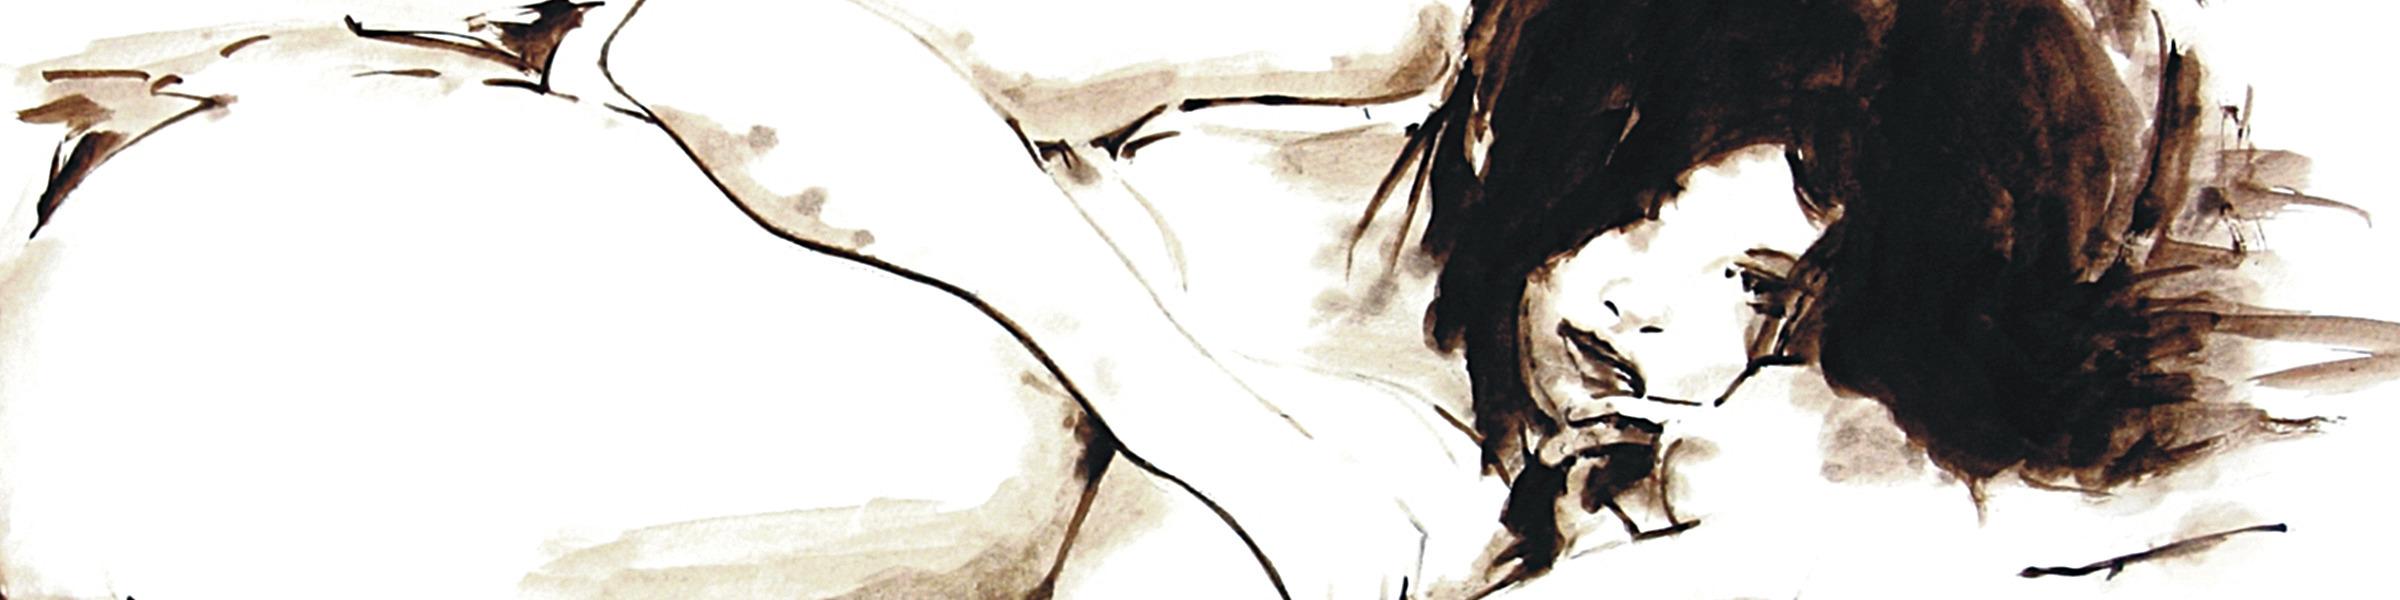 Melissa Mailer-Yates (@melissamyartist) Cover Image